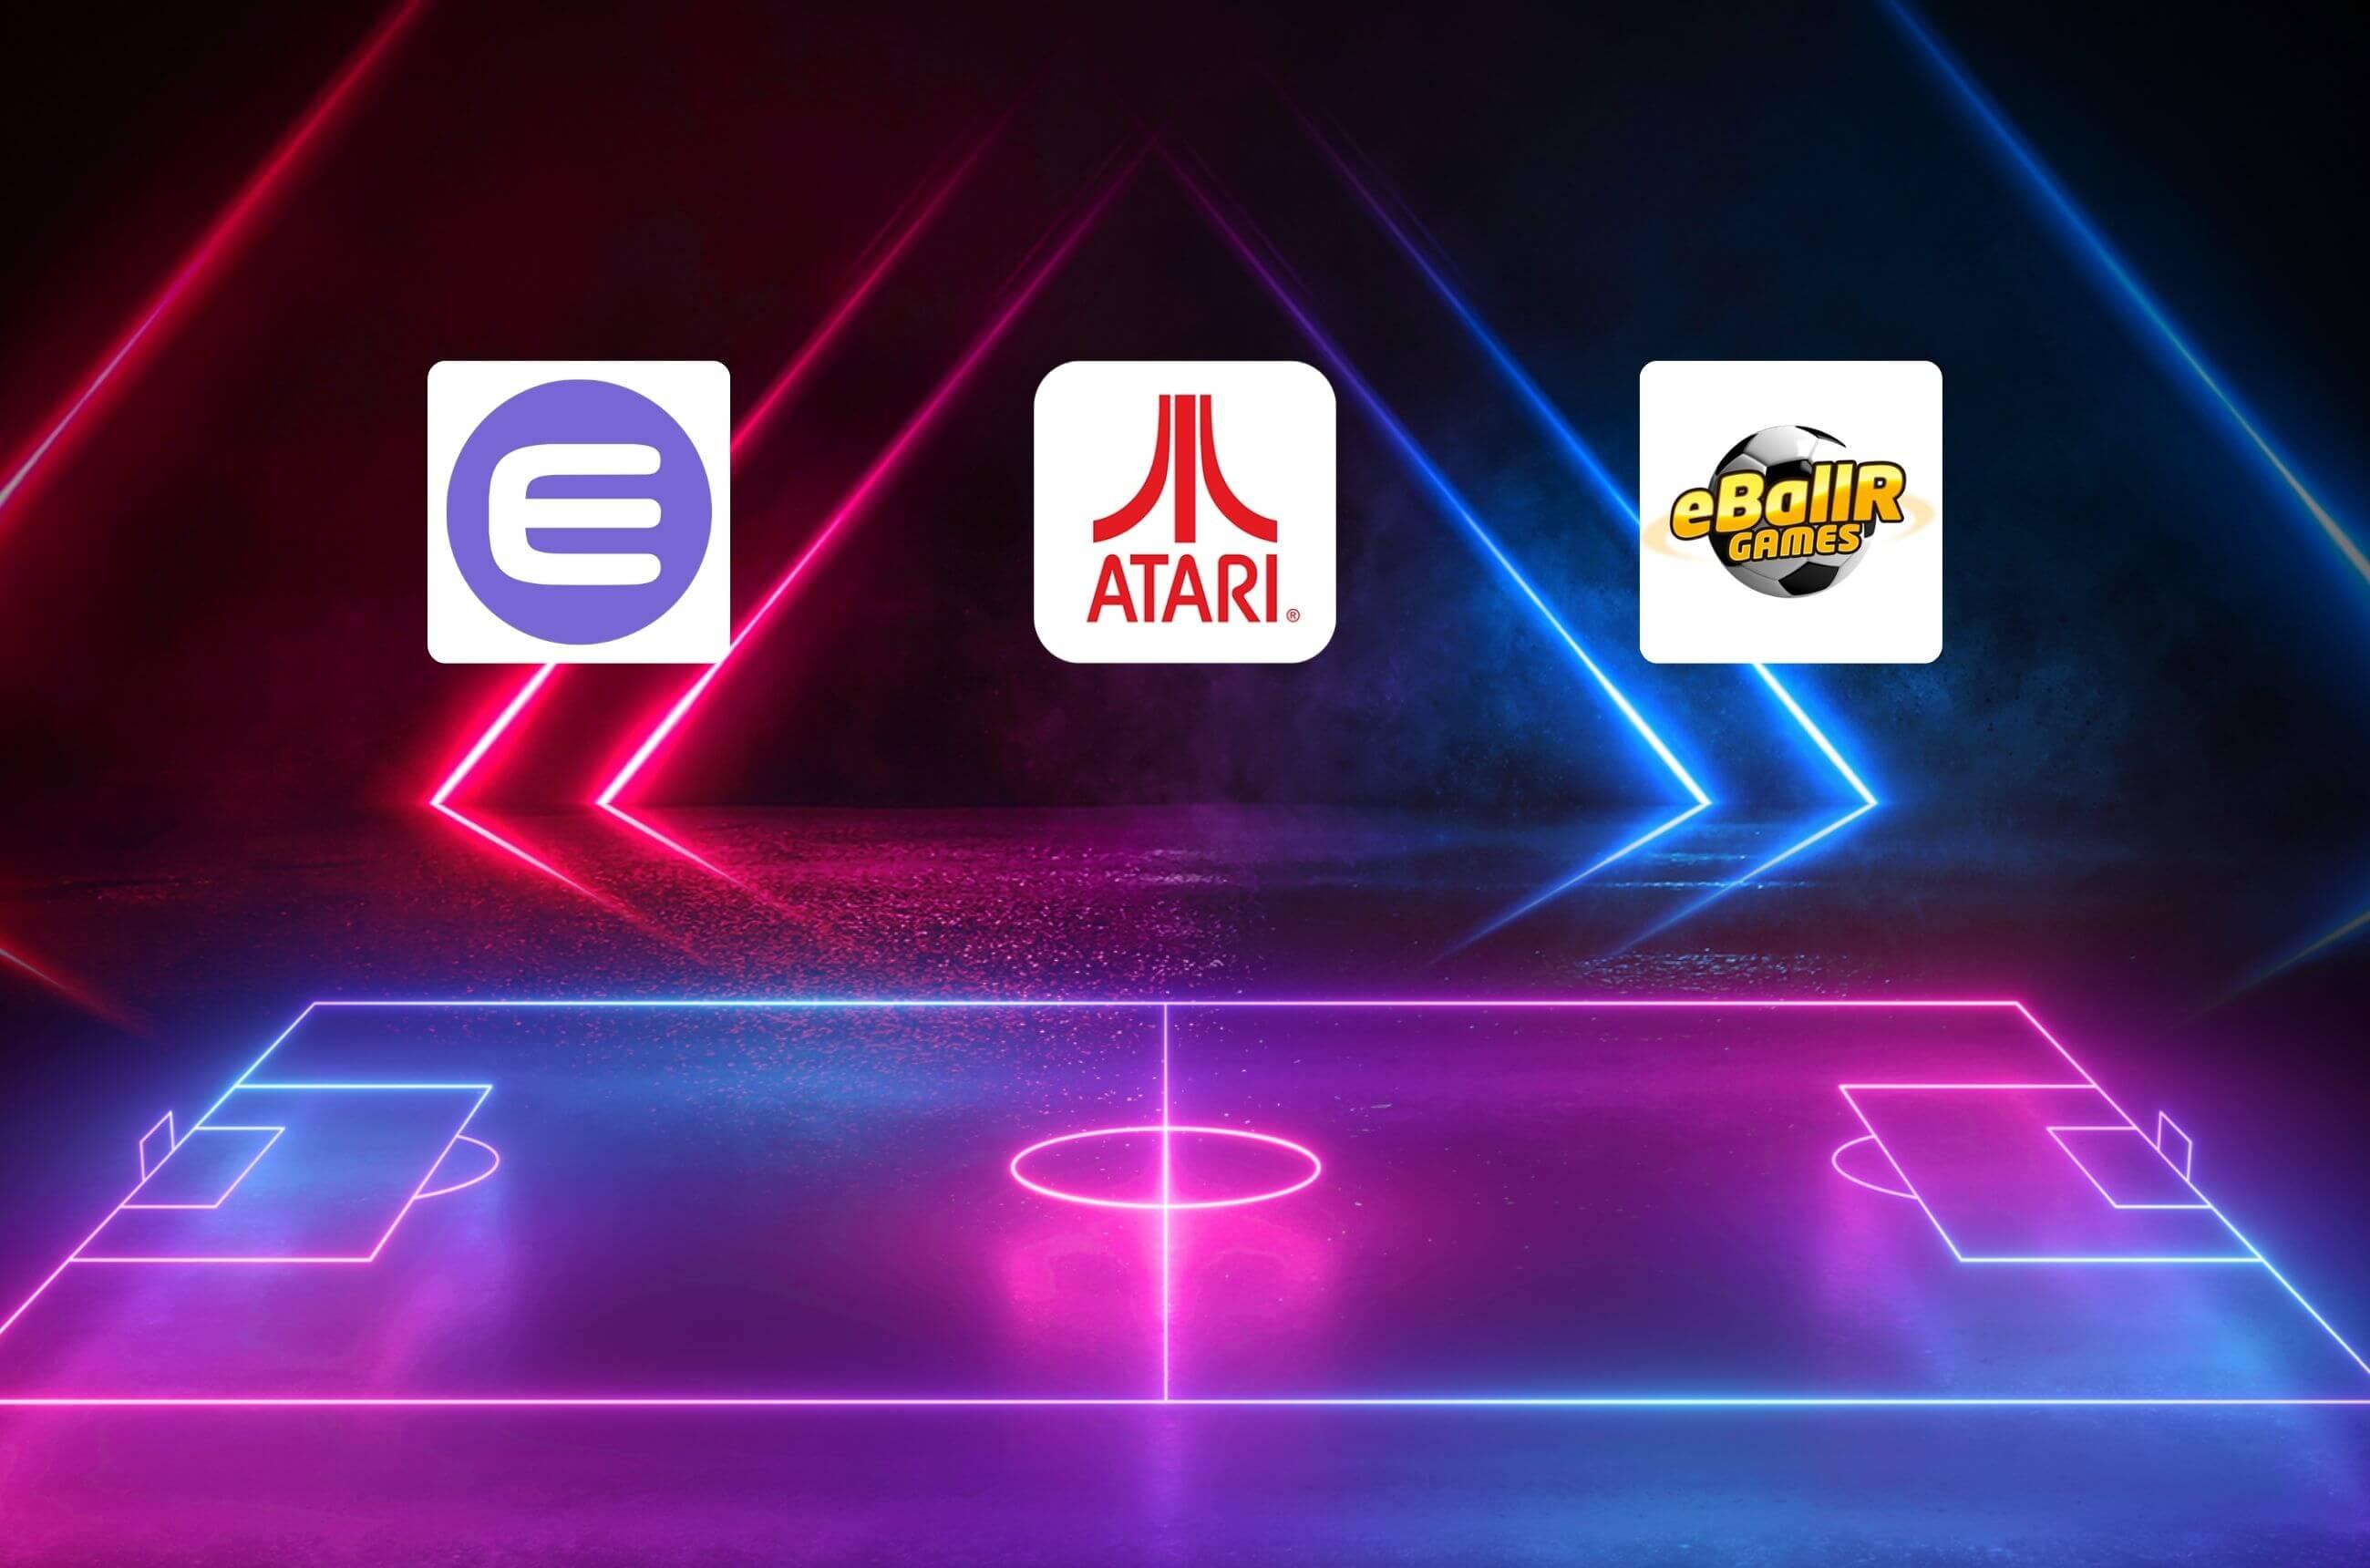 Welcoming Atari and eBallR Games to the Enjin Ecosystem